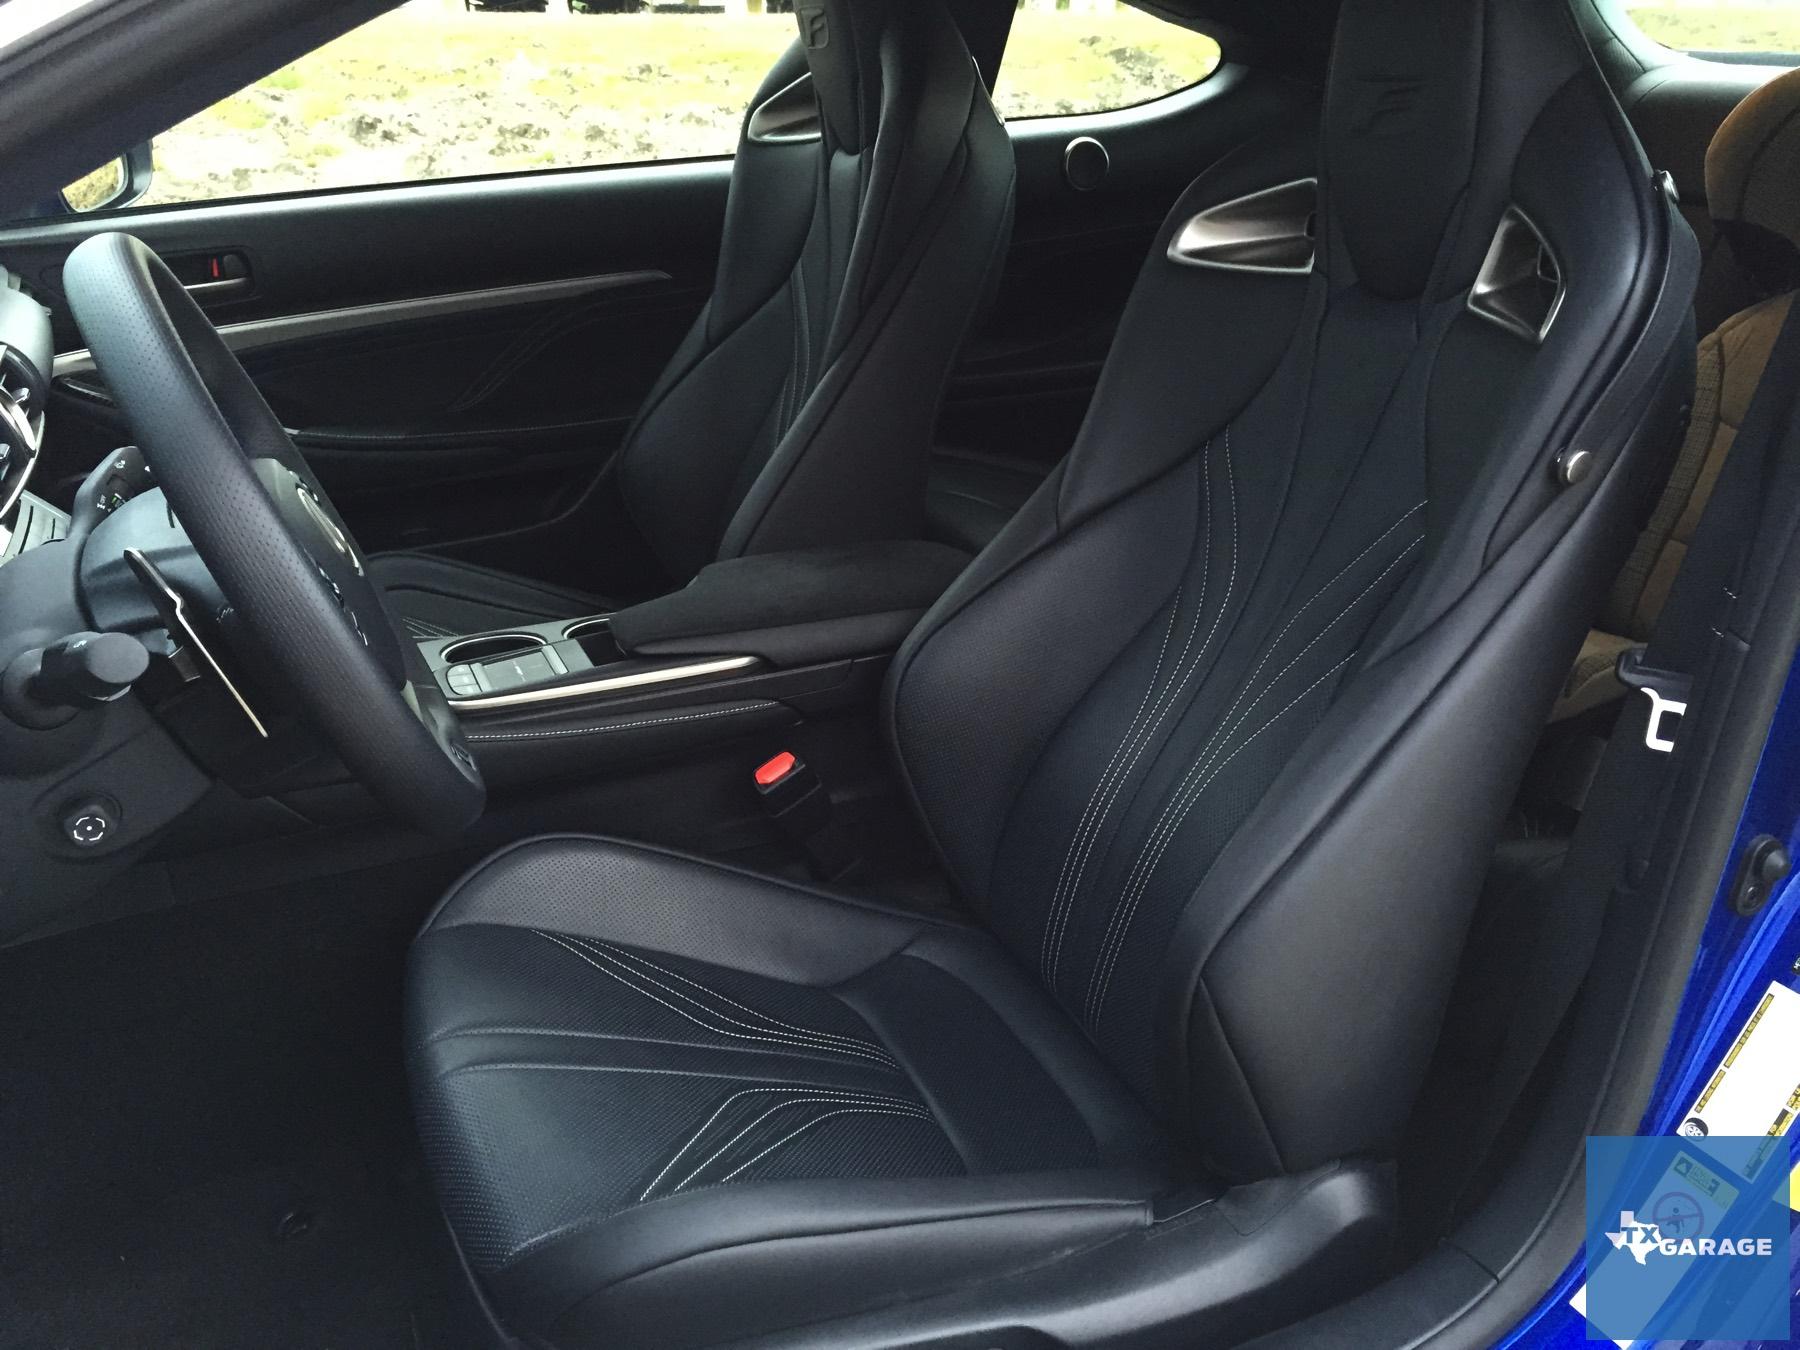 2015-Lexus-RC-F-txGarage-010